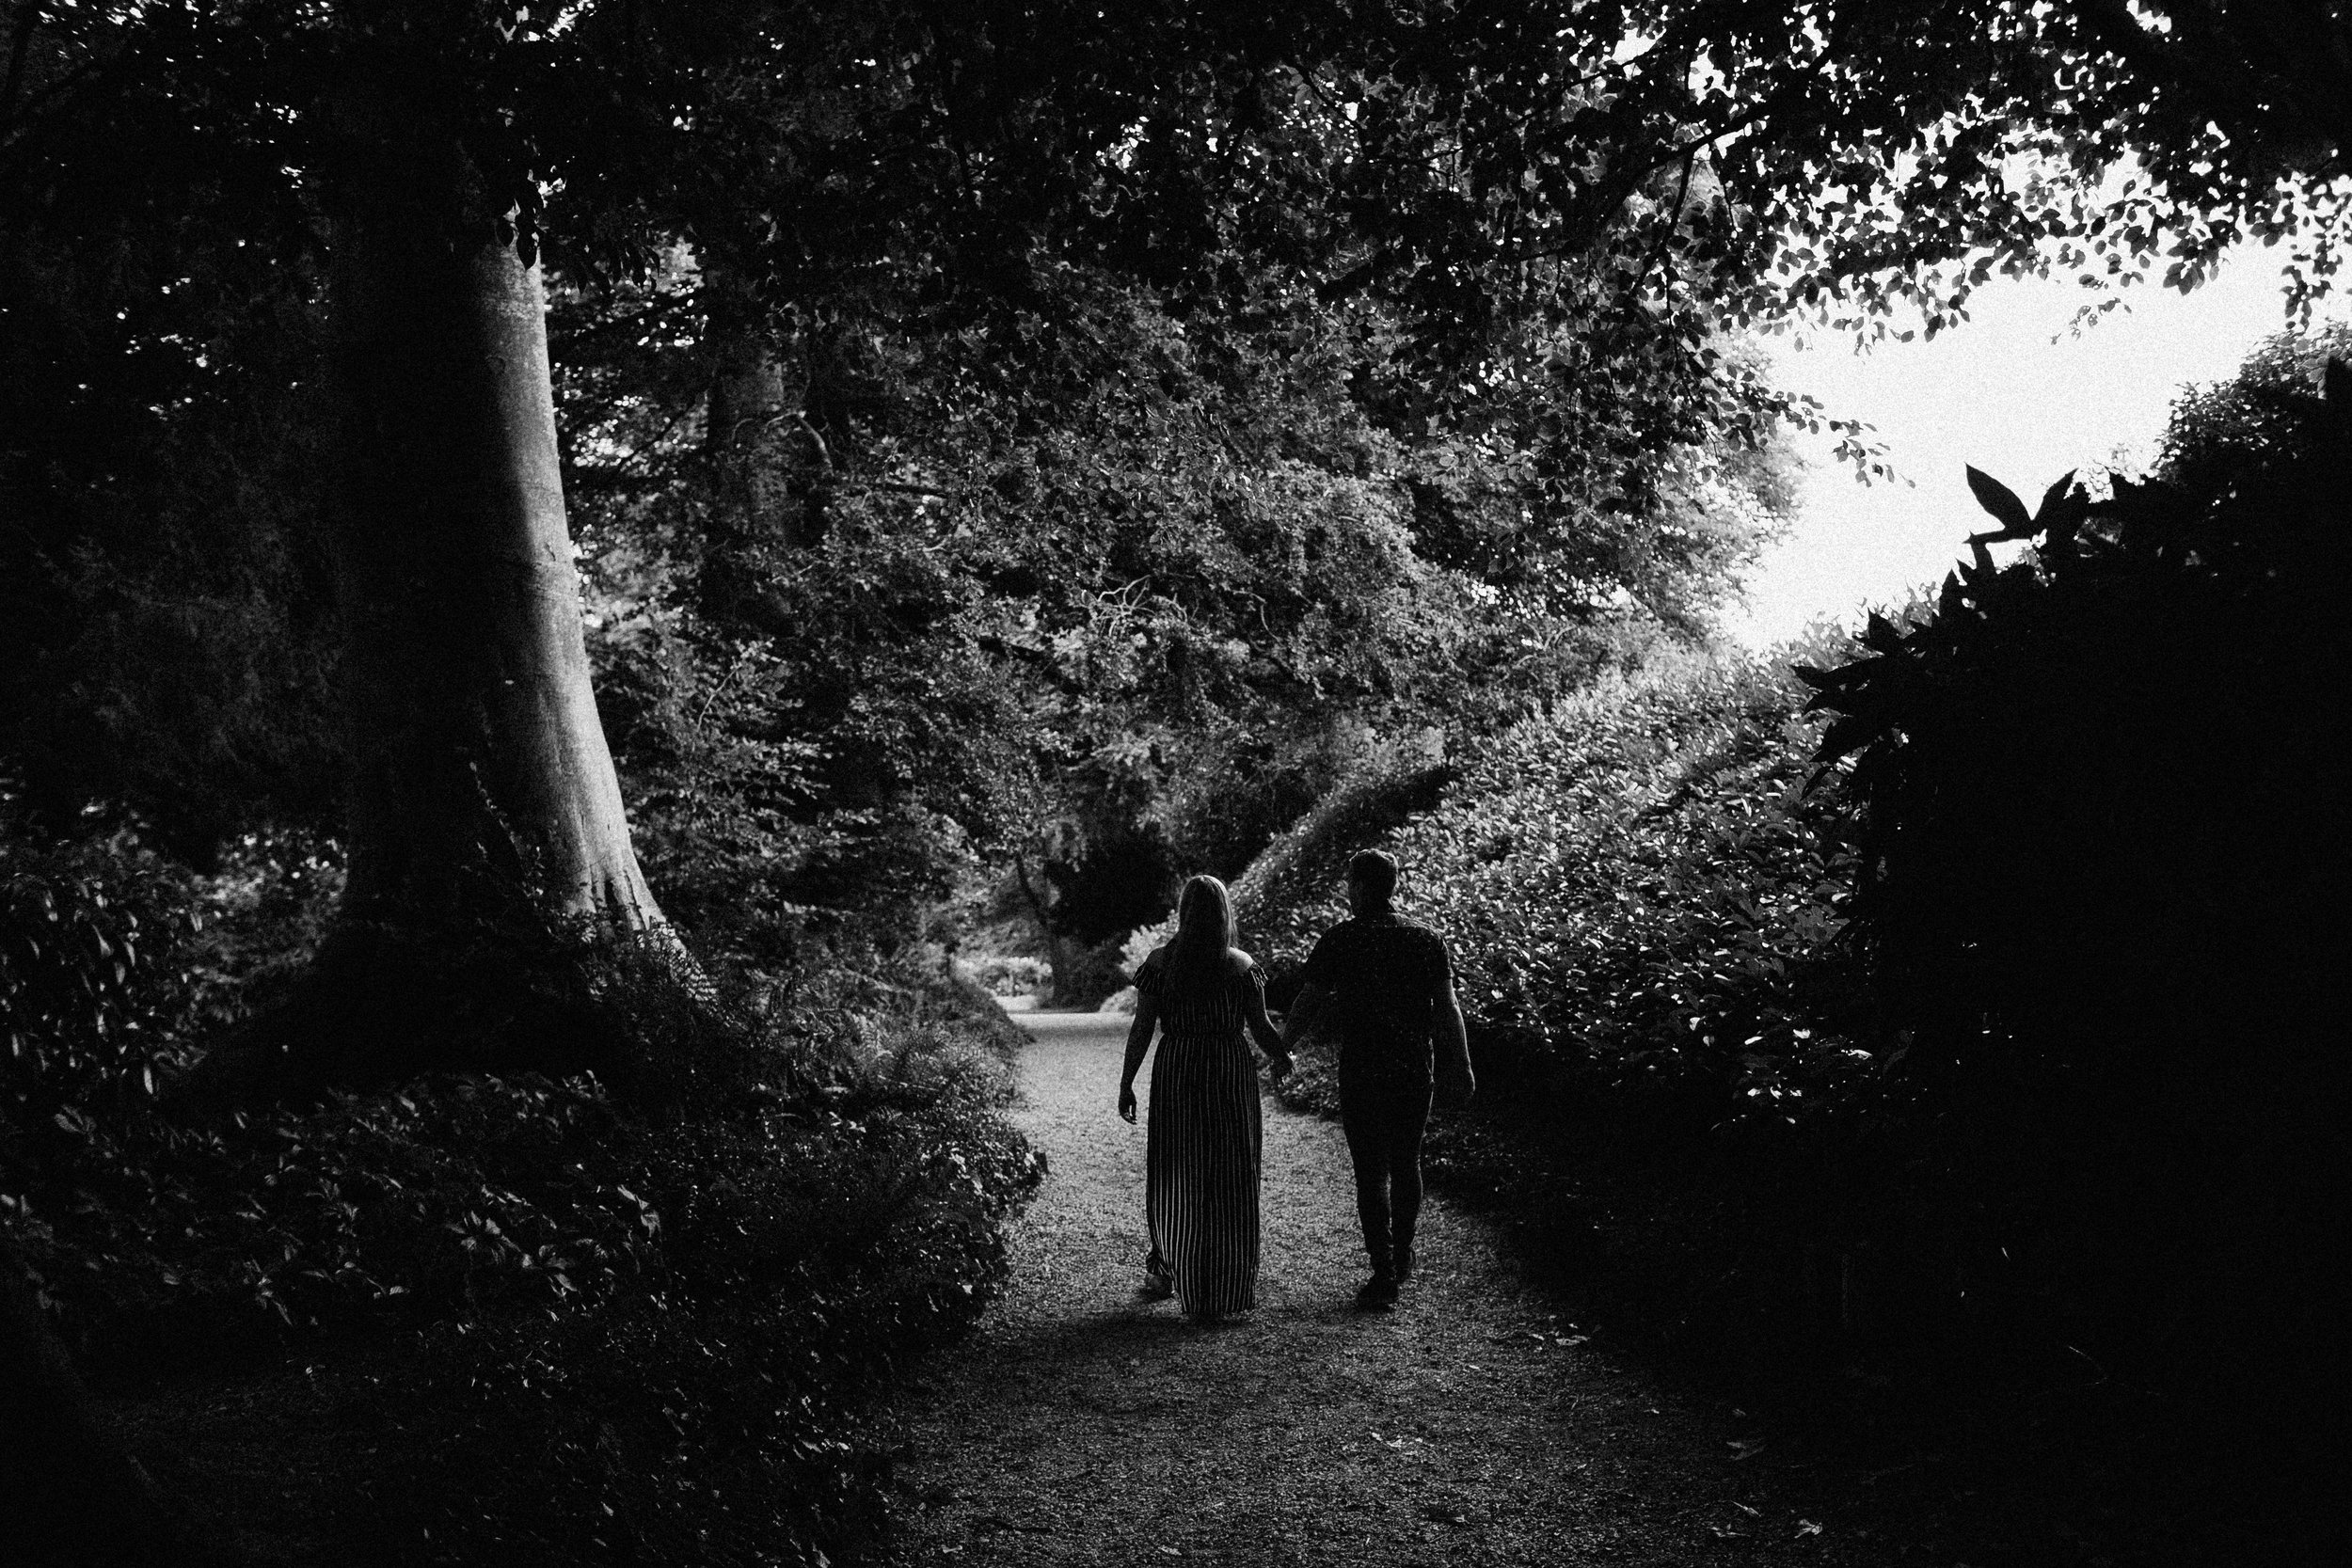 ireland_county_wicklow_glendalough_engagement_adventure_photography_windy_moody_atlanta_wedding_photographer_1002.jpg